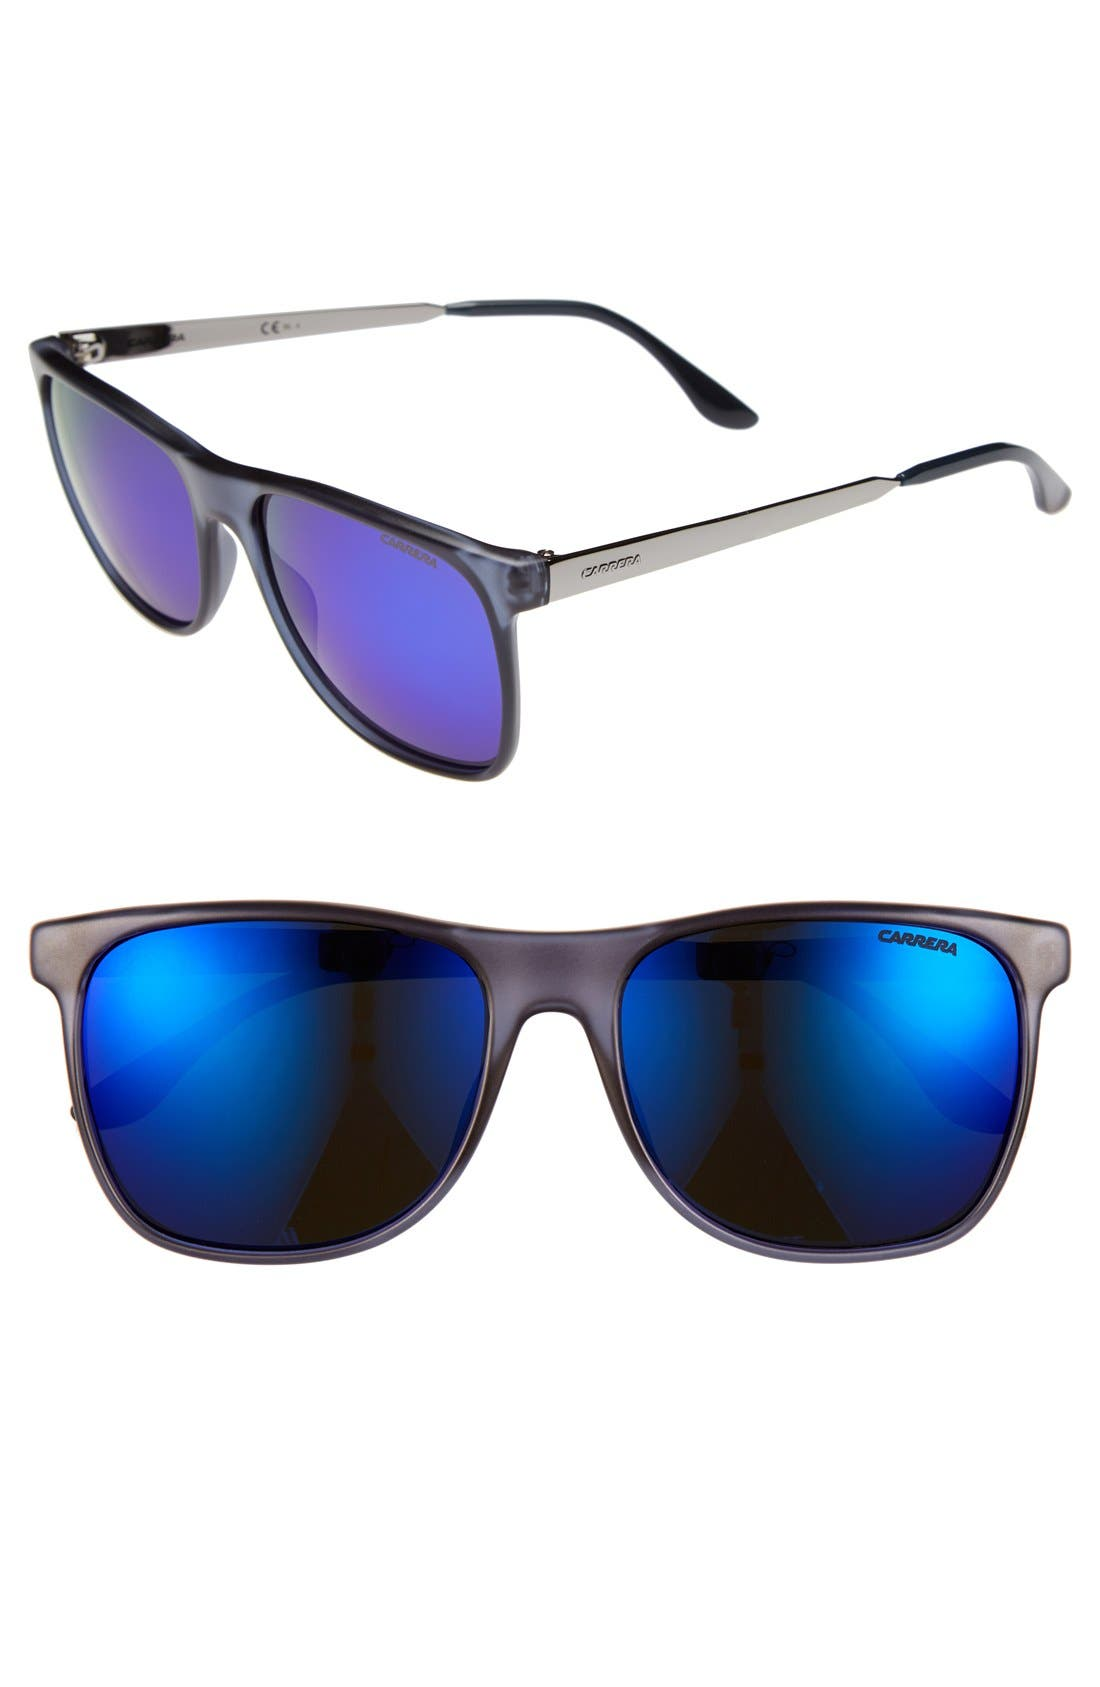 Alternate Image 1 Selected - Carrera Eyewear 57mm Retro Sunglasses